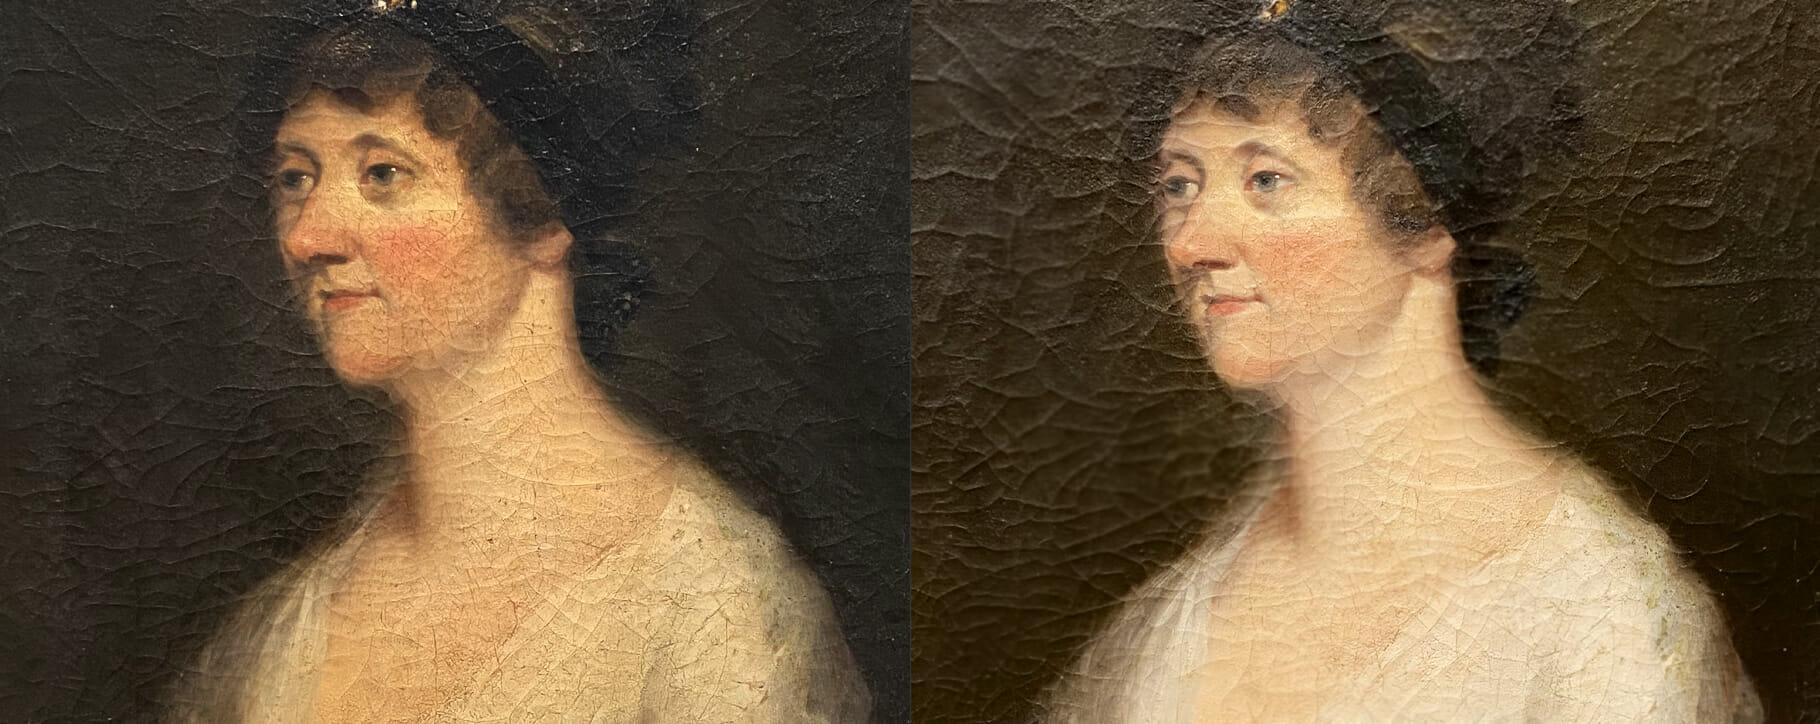 Regency Cracked Discoloured Portrait